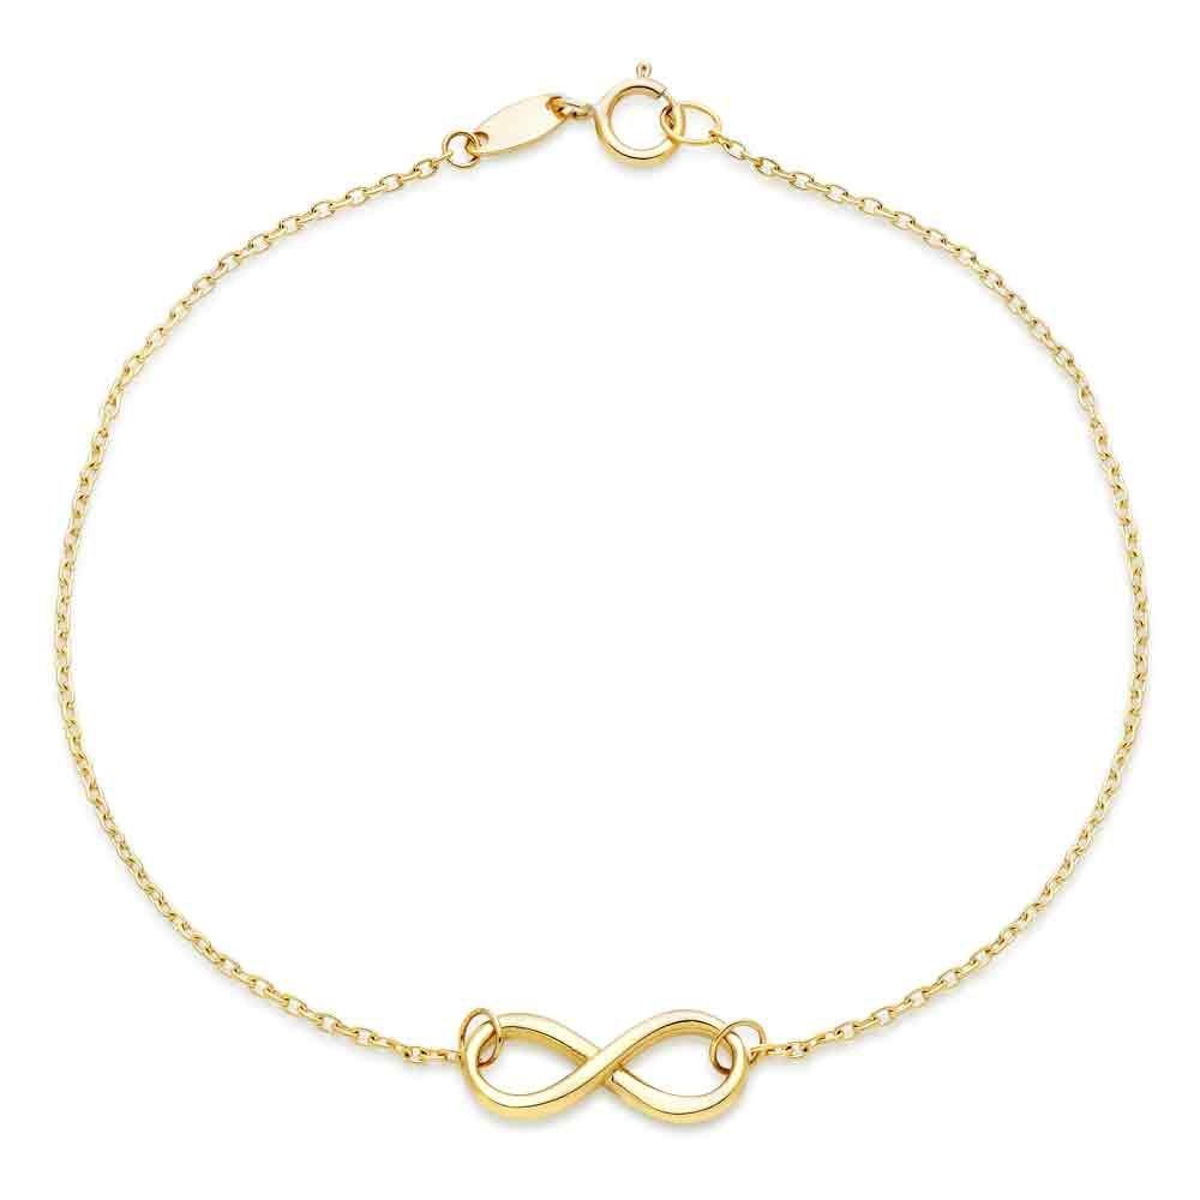 9ct Gold Infinity Bracelet